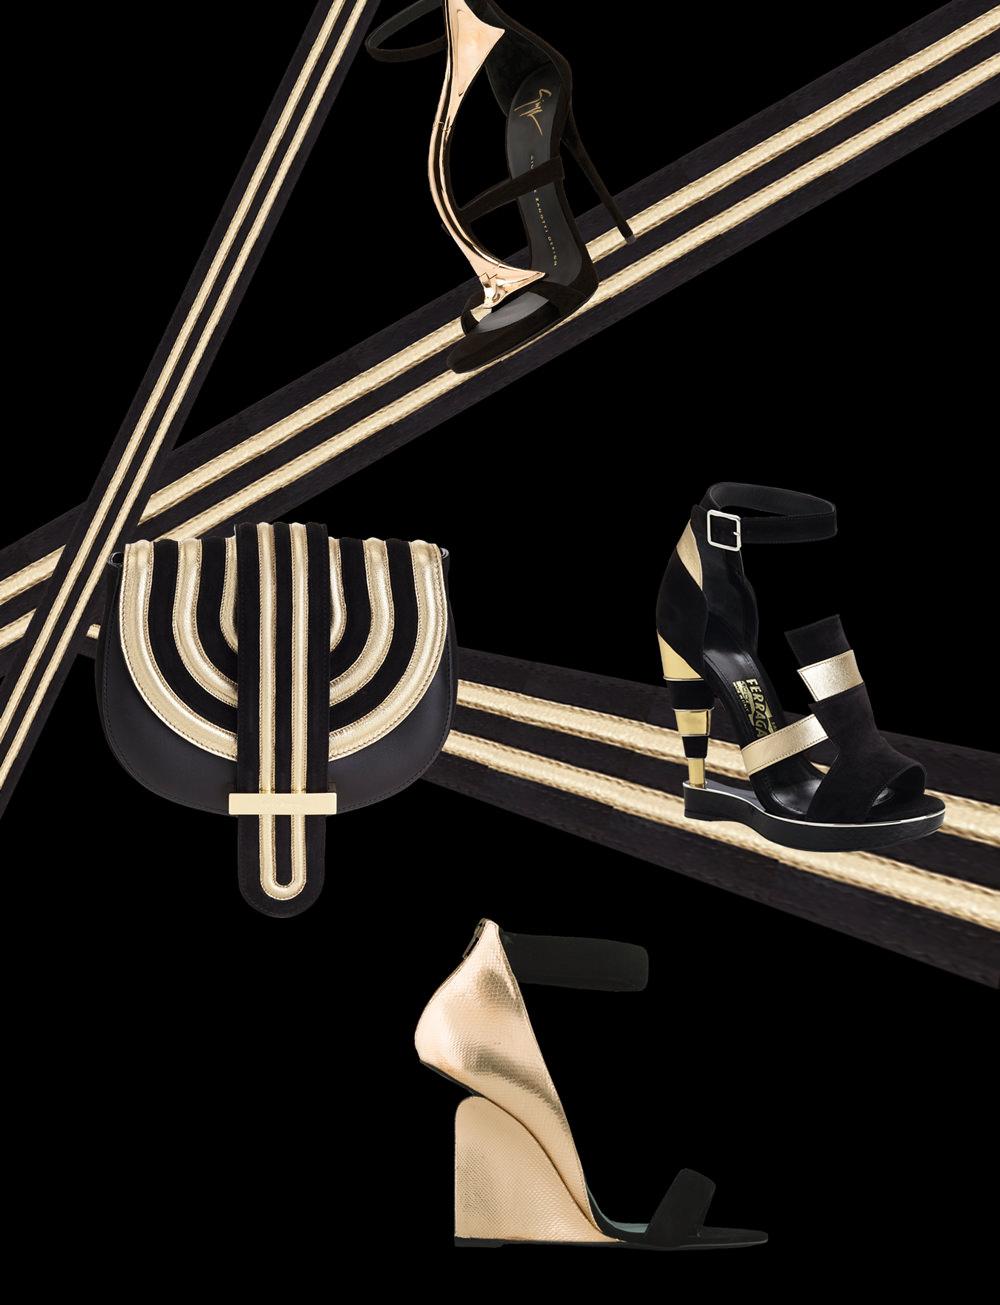 Art Deco inspired Accessories